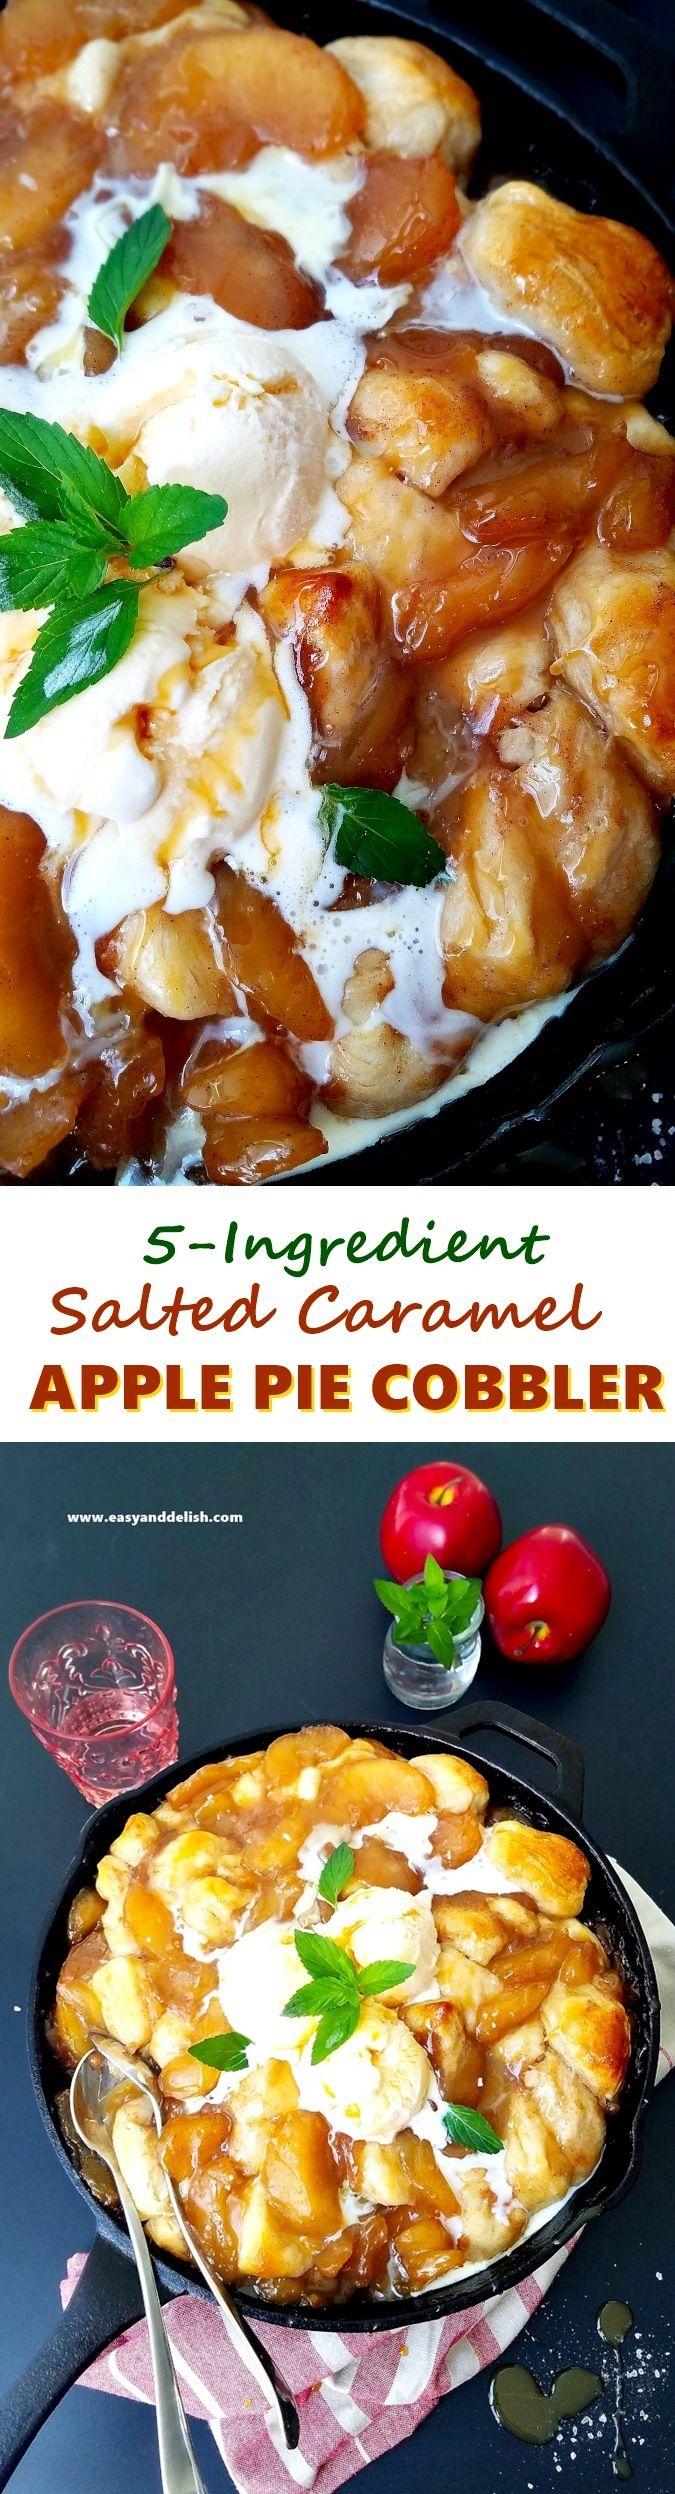 5-Ingredient Salted Caramel Apple Pie Cobbler